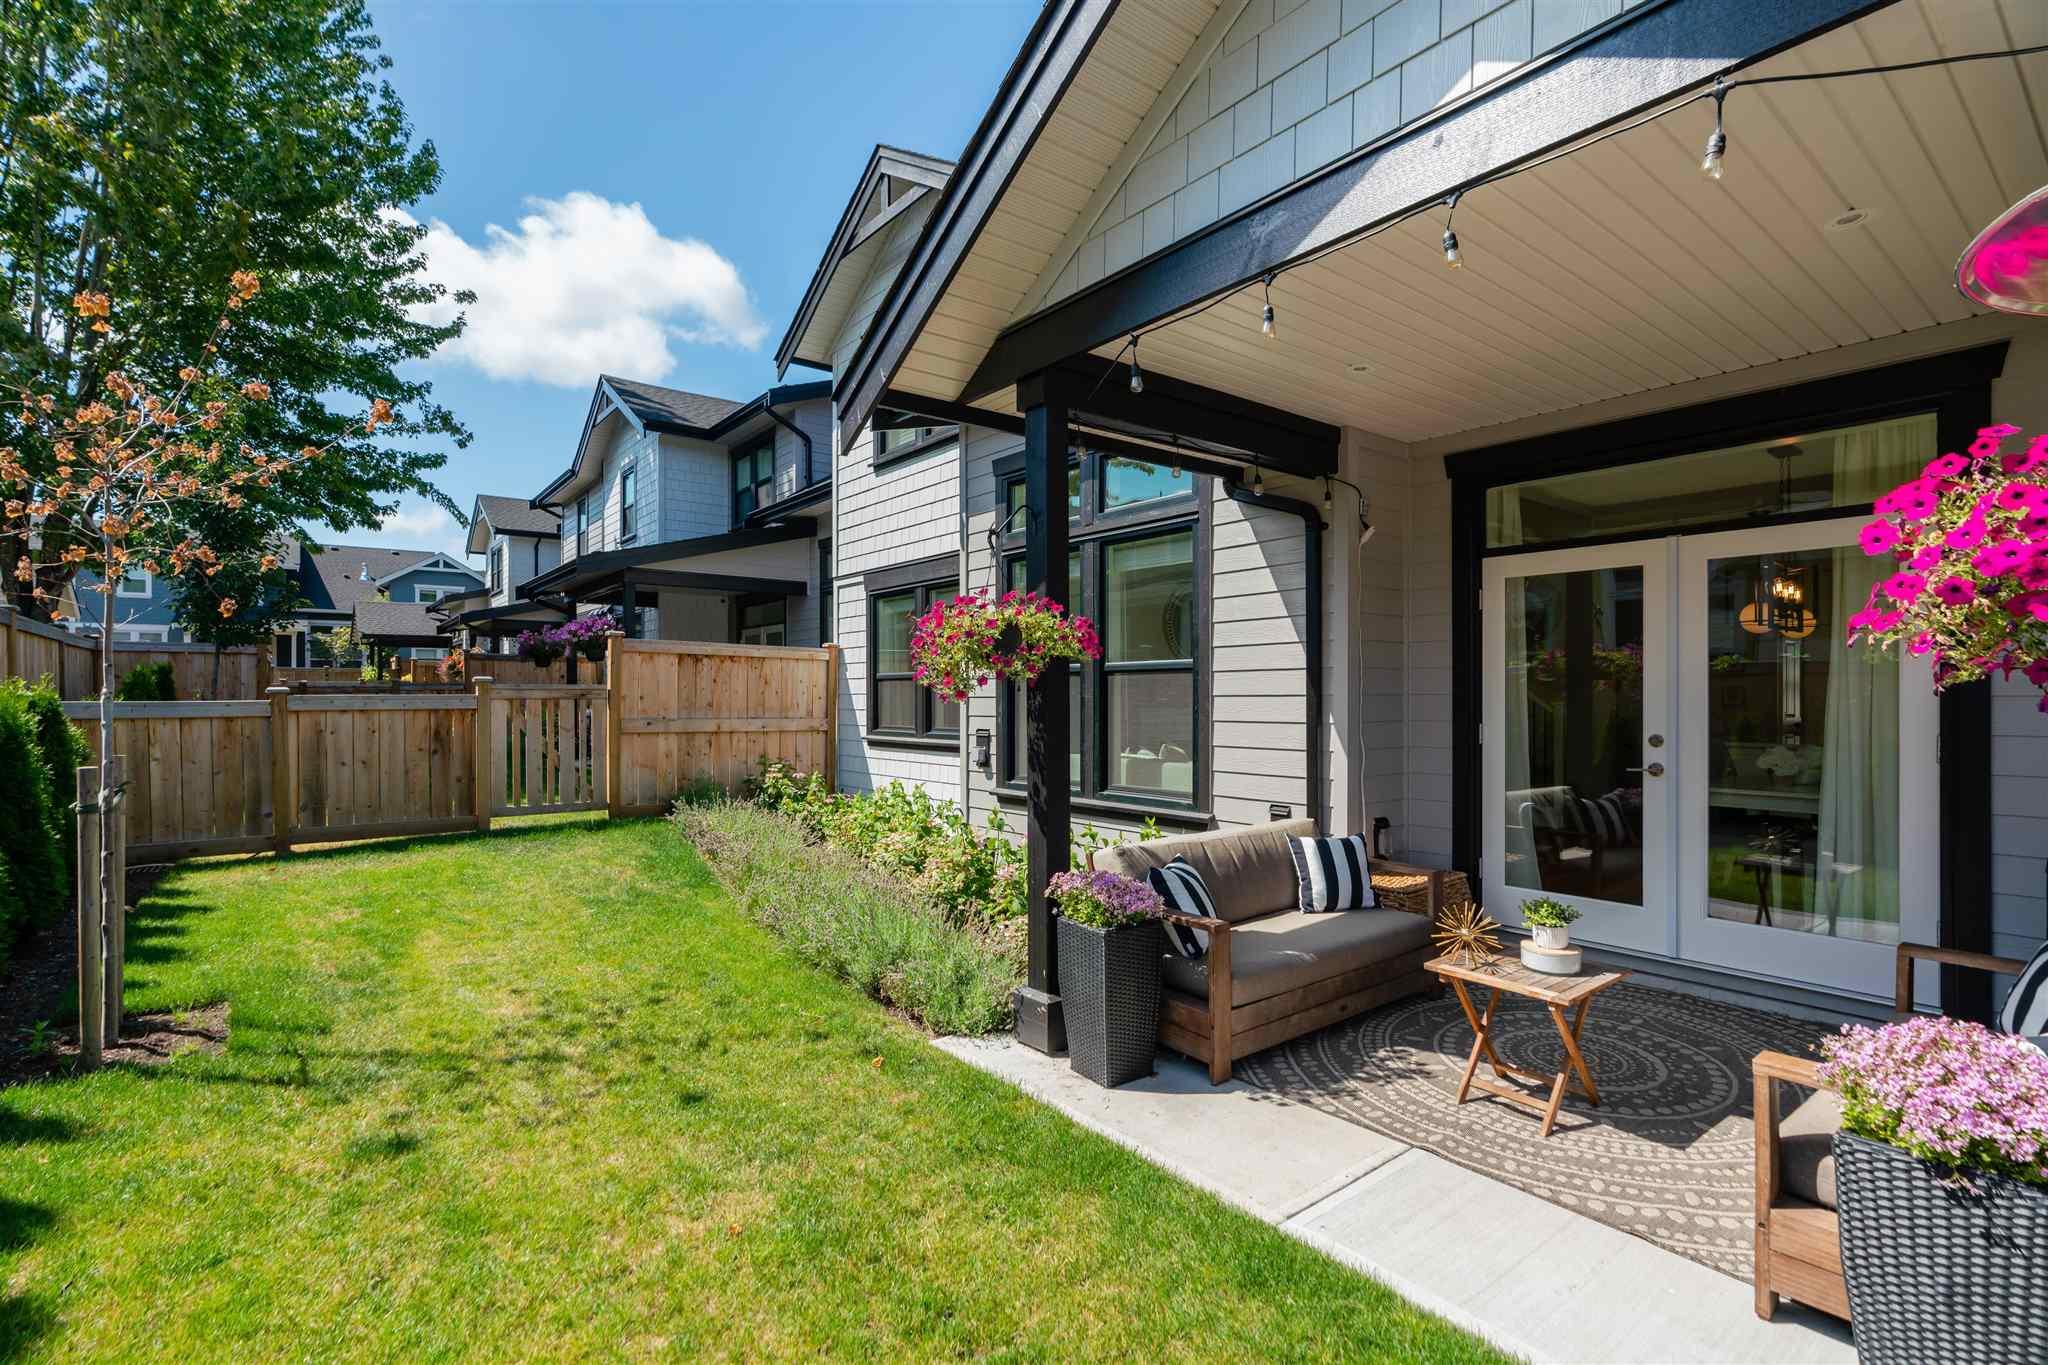 40 21858 47B AVENUE - Murrayville Townhouse for sale, 4 Bedrooms (R2603956) - #34